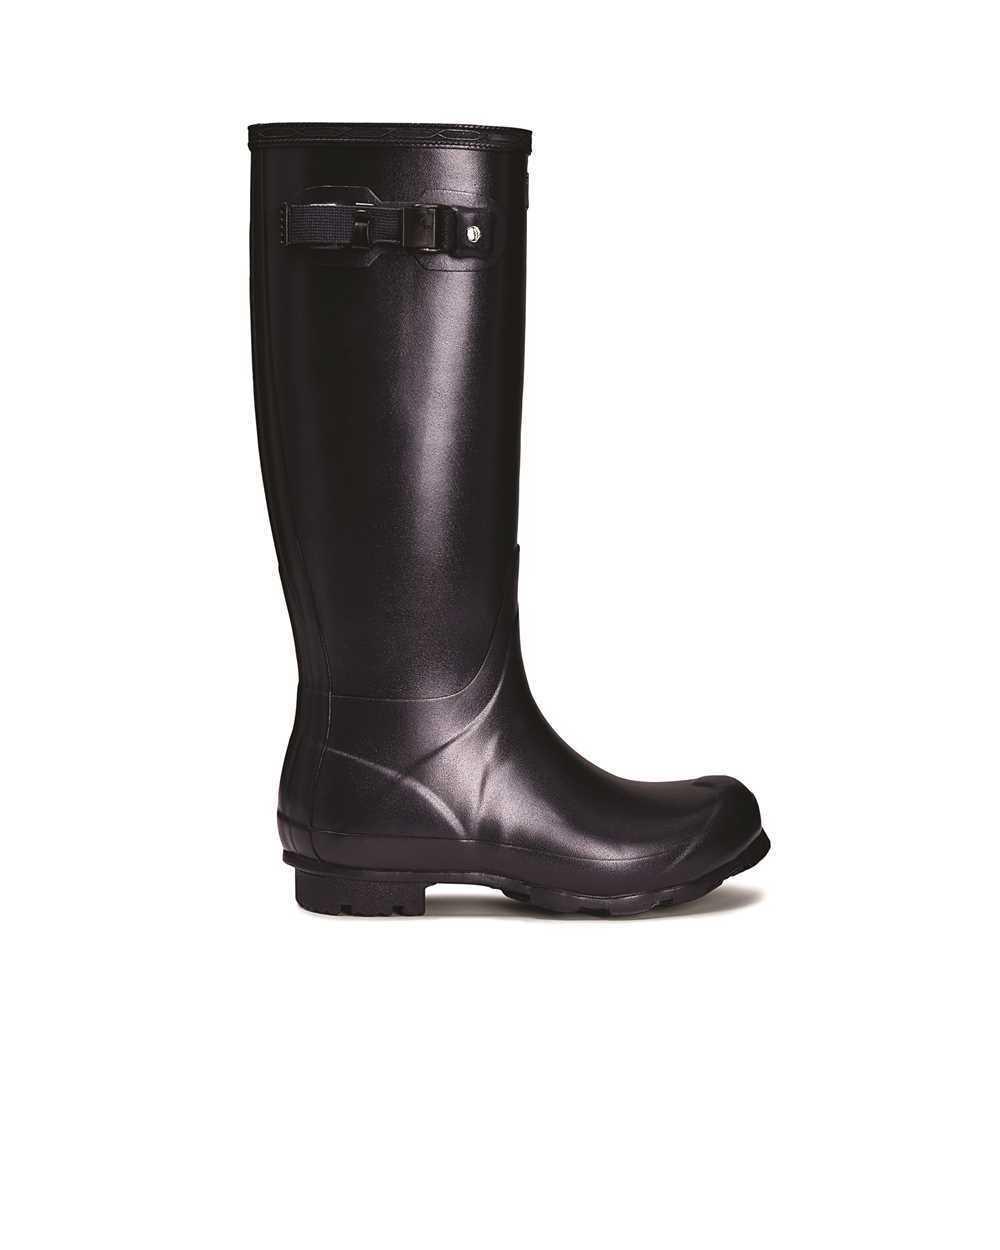 Genuine New Hunter Norris Field Tall Damenschuhe Navy Wellington Stiefel UK Größes 3-9